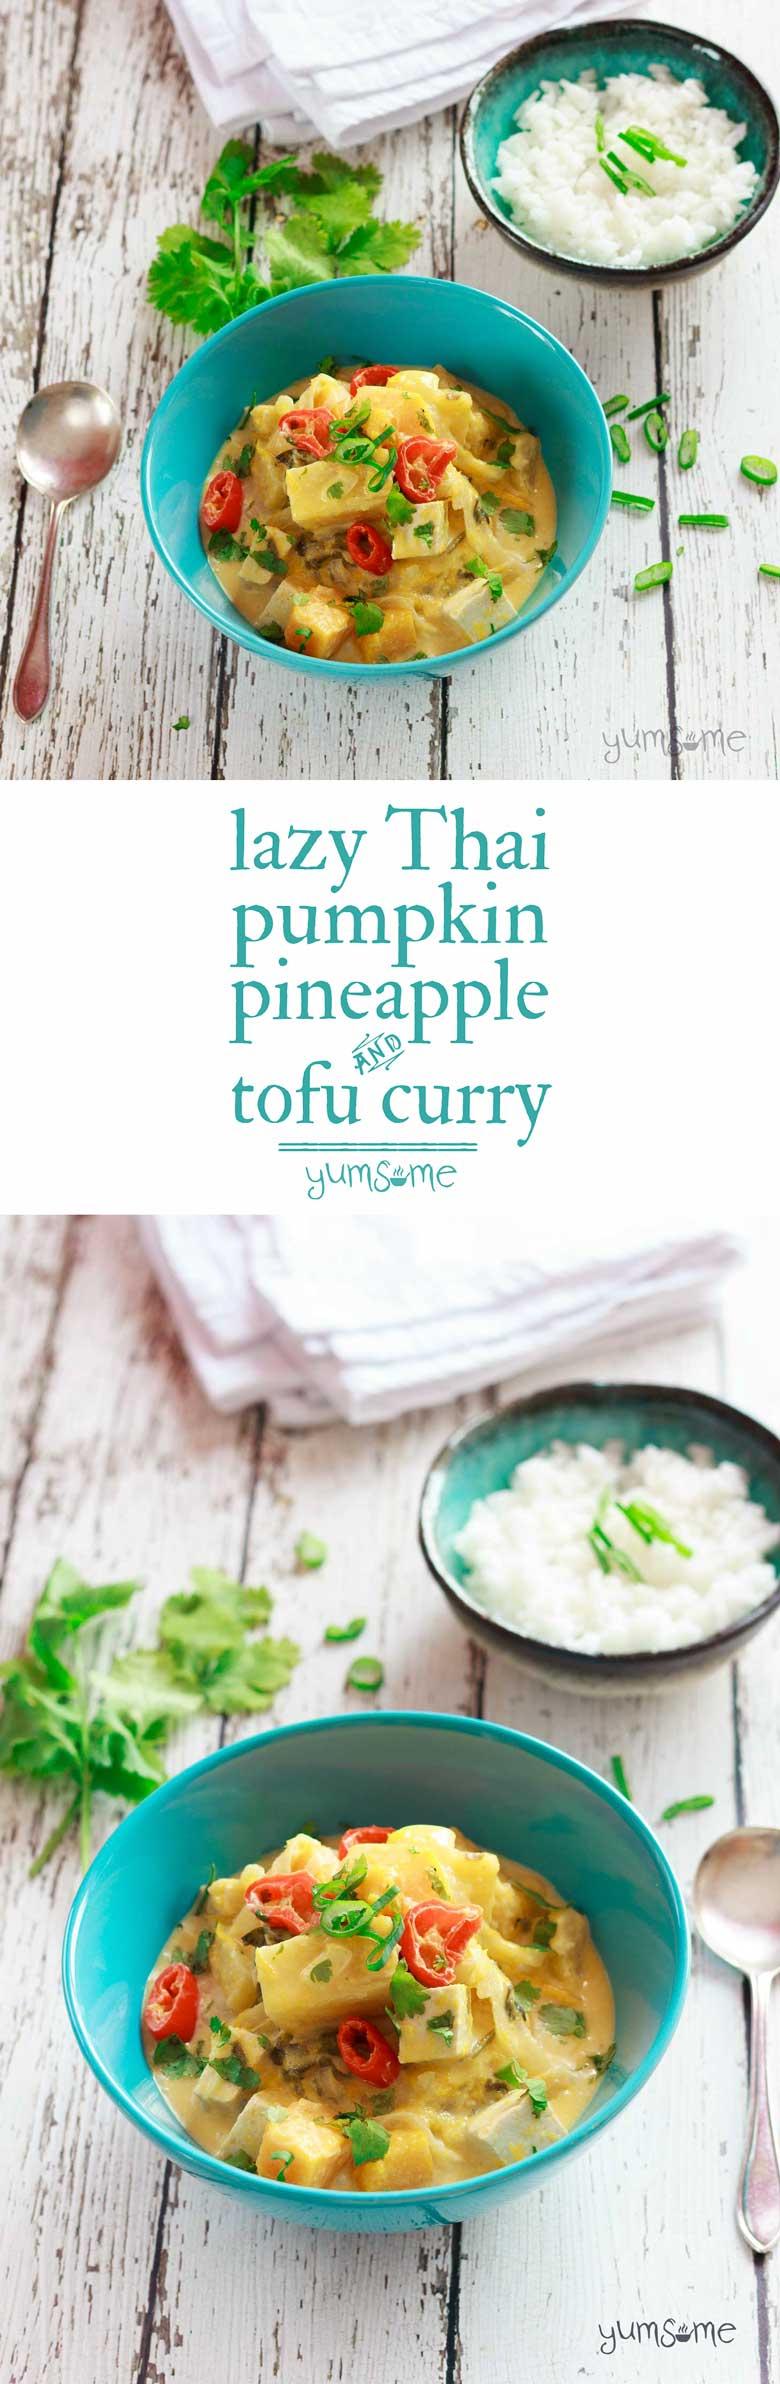 Lazy Thai Pumpkin, Pineapple, and Tofu Curry